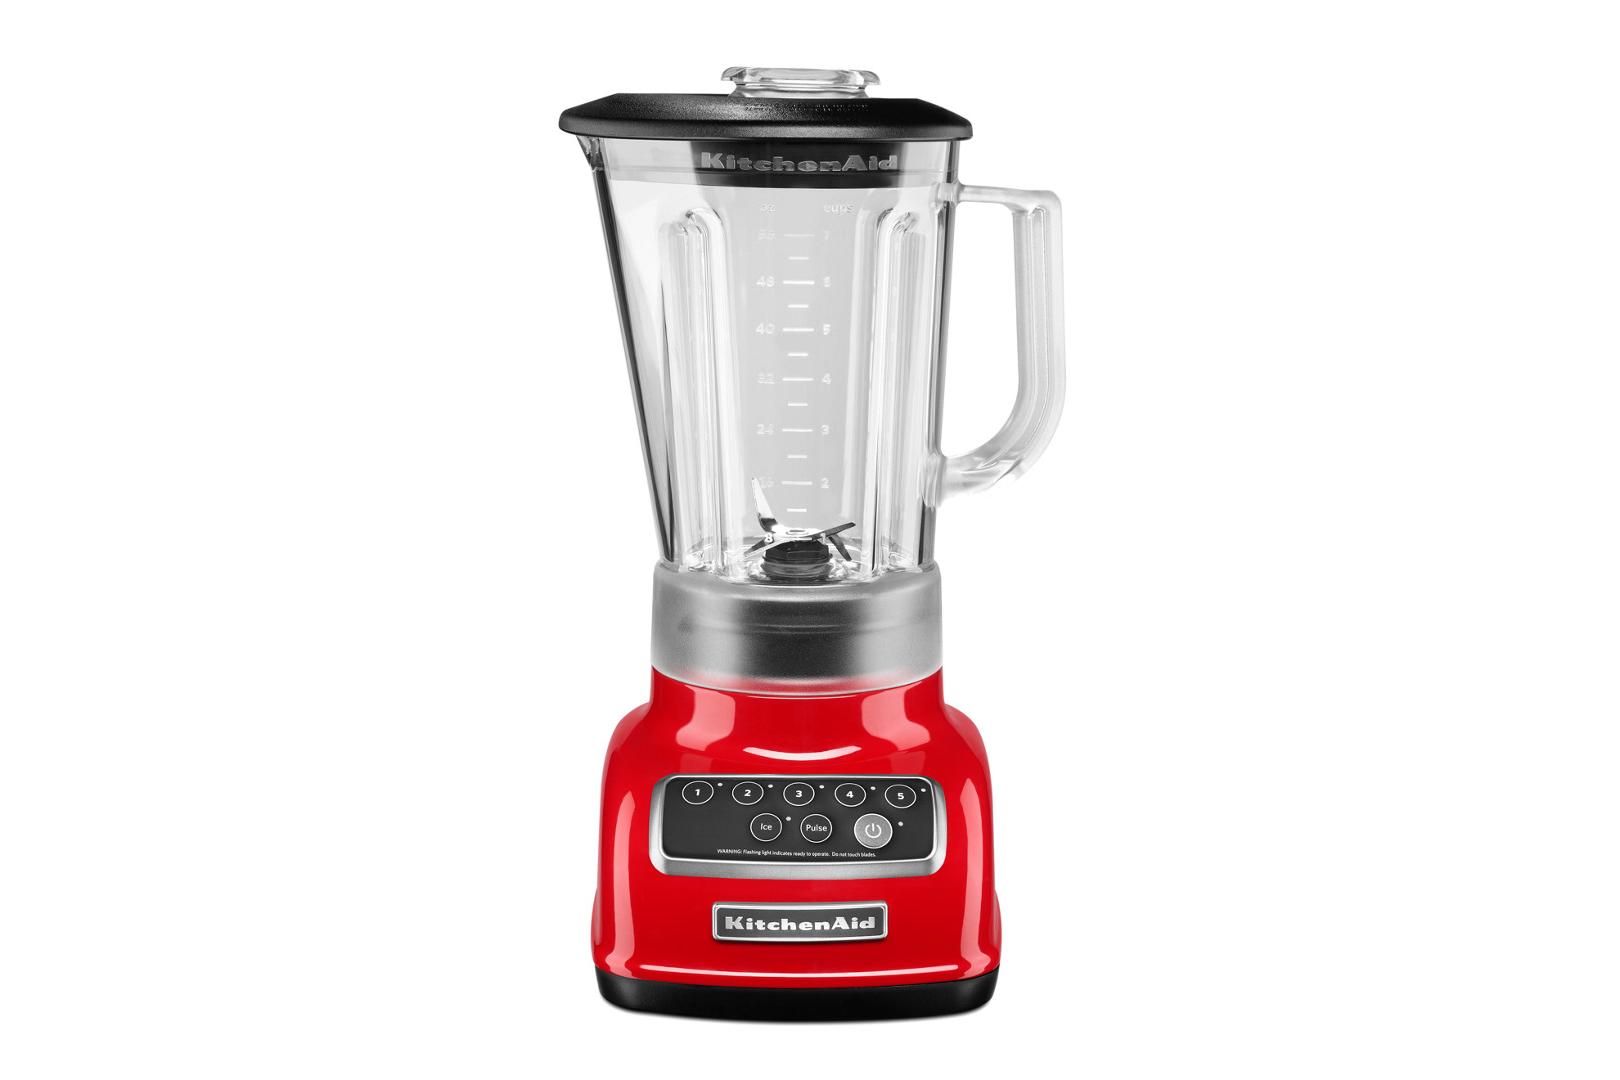 KitchenAid 56-oz BPA-Free Pitcher 5-Speed Blender